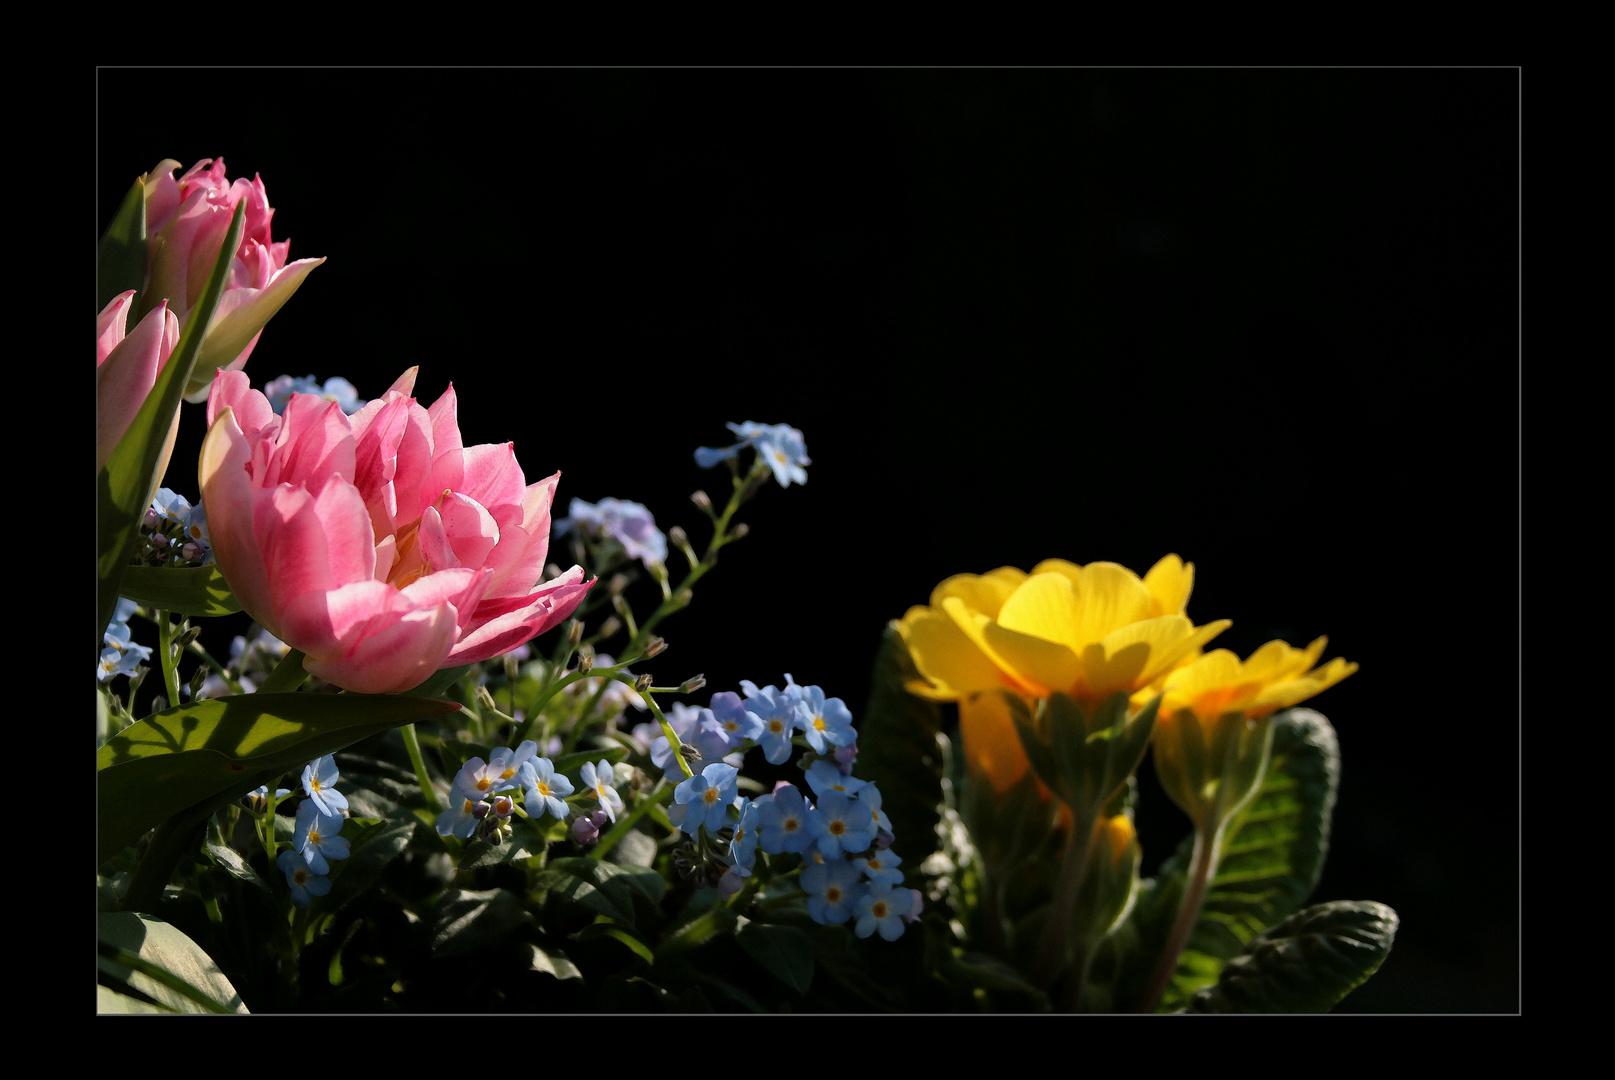 das leuchten foto bild pflanzen pilze flechten bl ten kleinpflanzen tulpen bilder. Black Bedroom Furniture Sets. Home Design Ideas